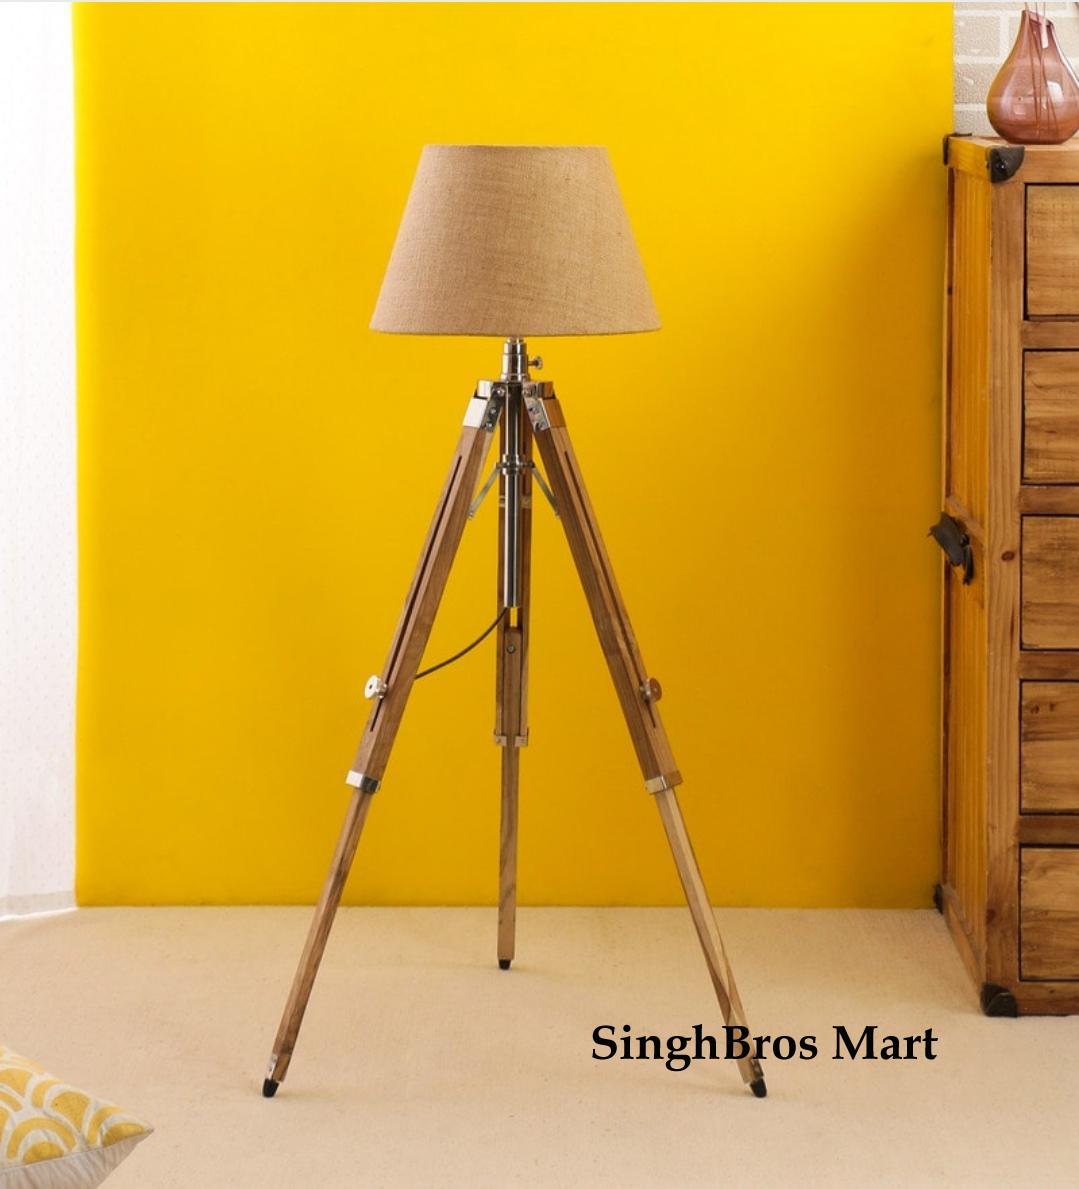 best service 3b71f 02731 Nautical Floor Lamp Wooden Tripod Lighting Stand Shade Fixture Home  Decorative